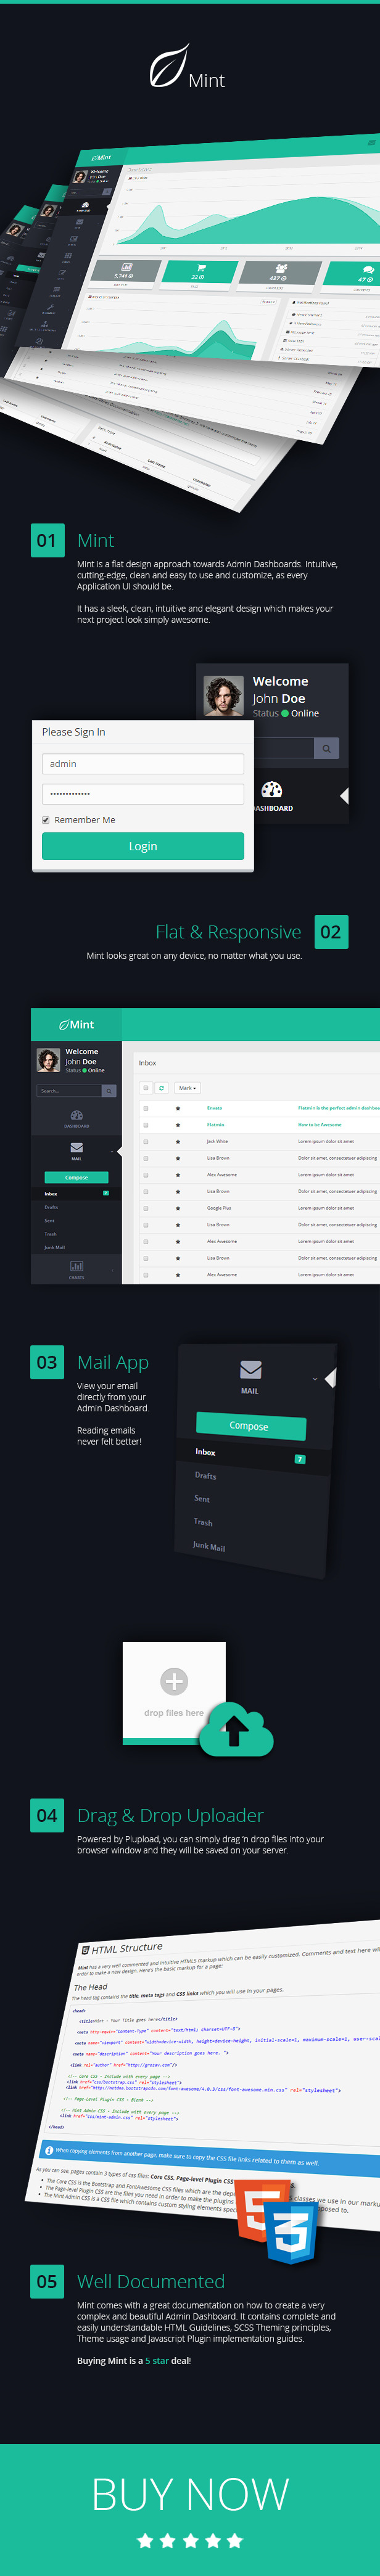 Mint - Flat & Responsive Admin Dashboard Template